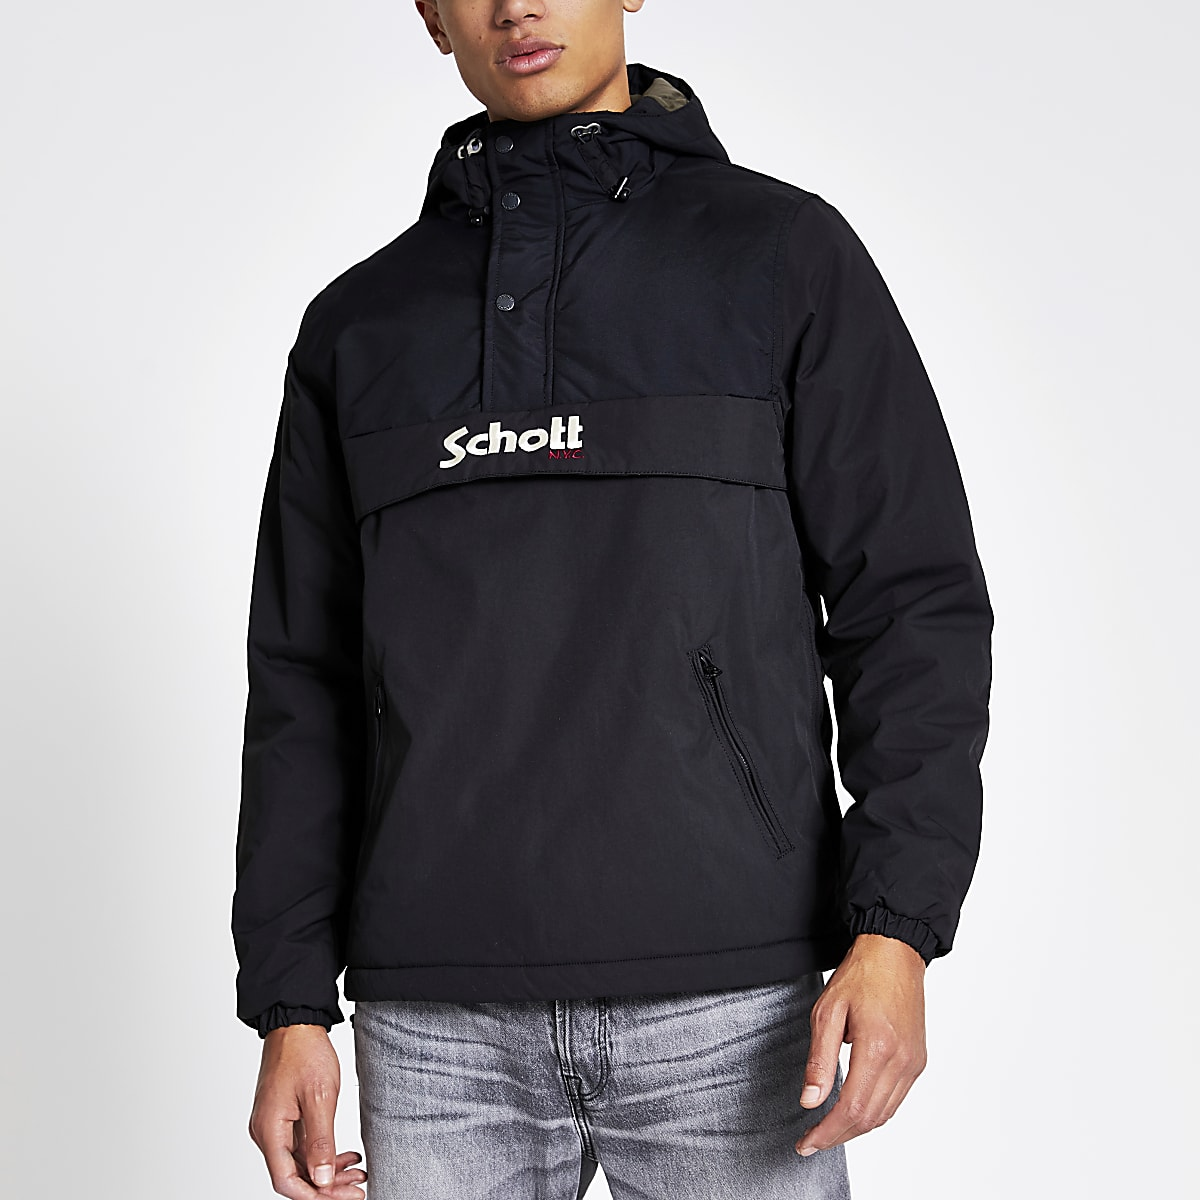 Schott black logo anorak jacket